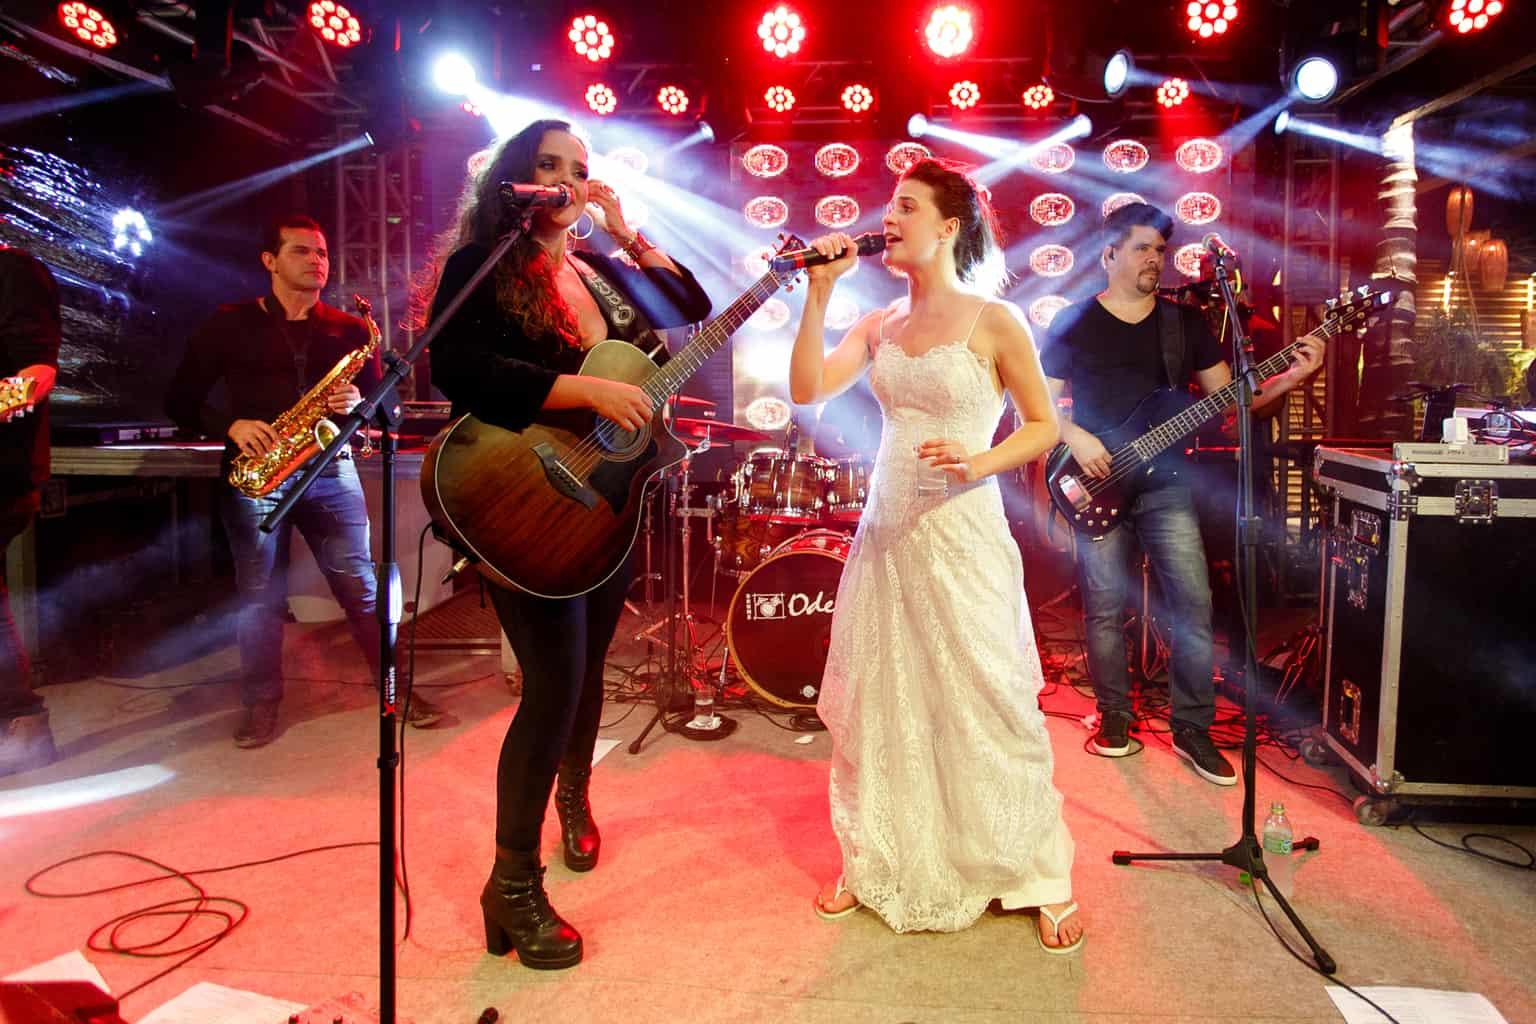 Casamento-Emanuelle-e-Alysson-Fotografia-Tadeu-Nanó-e-Luca-Antunes186